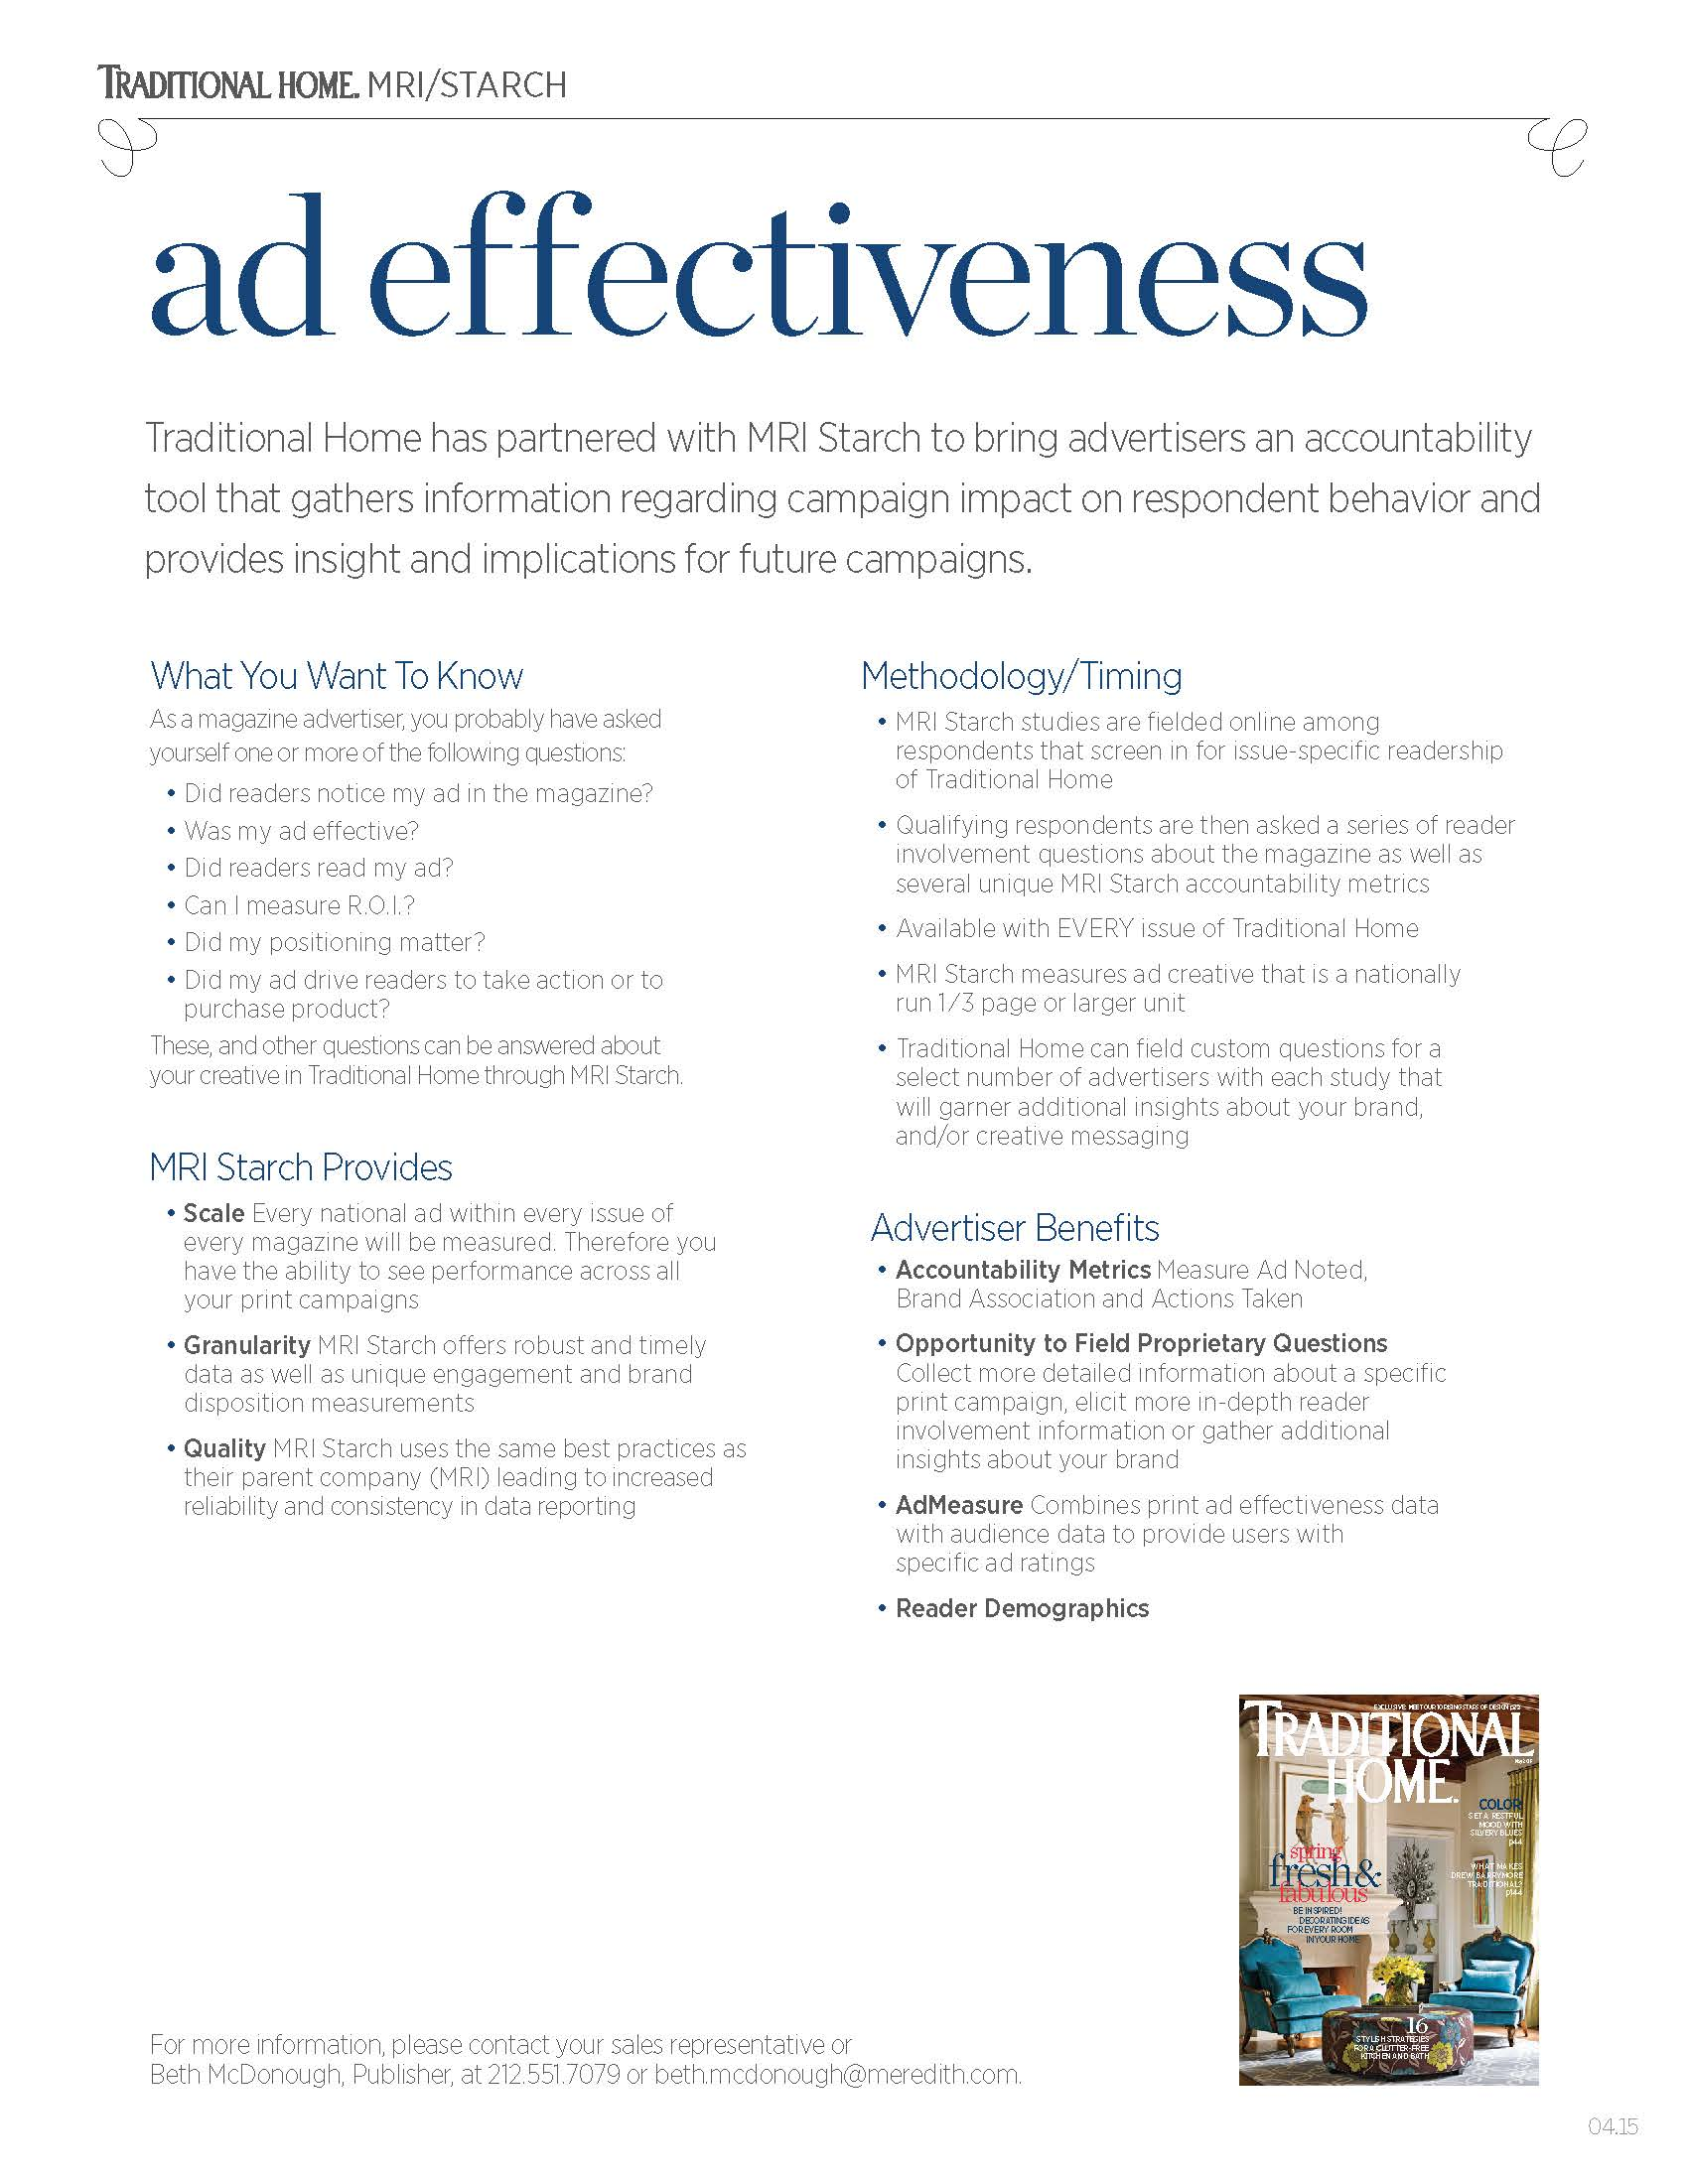 Ad-Effectiveness_2015.jpg